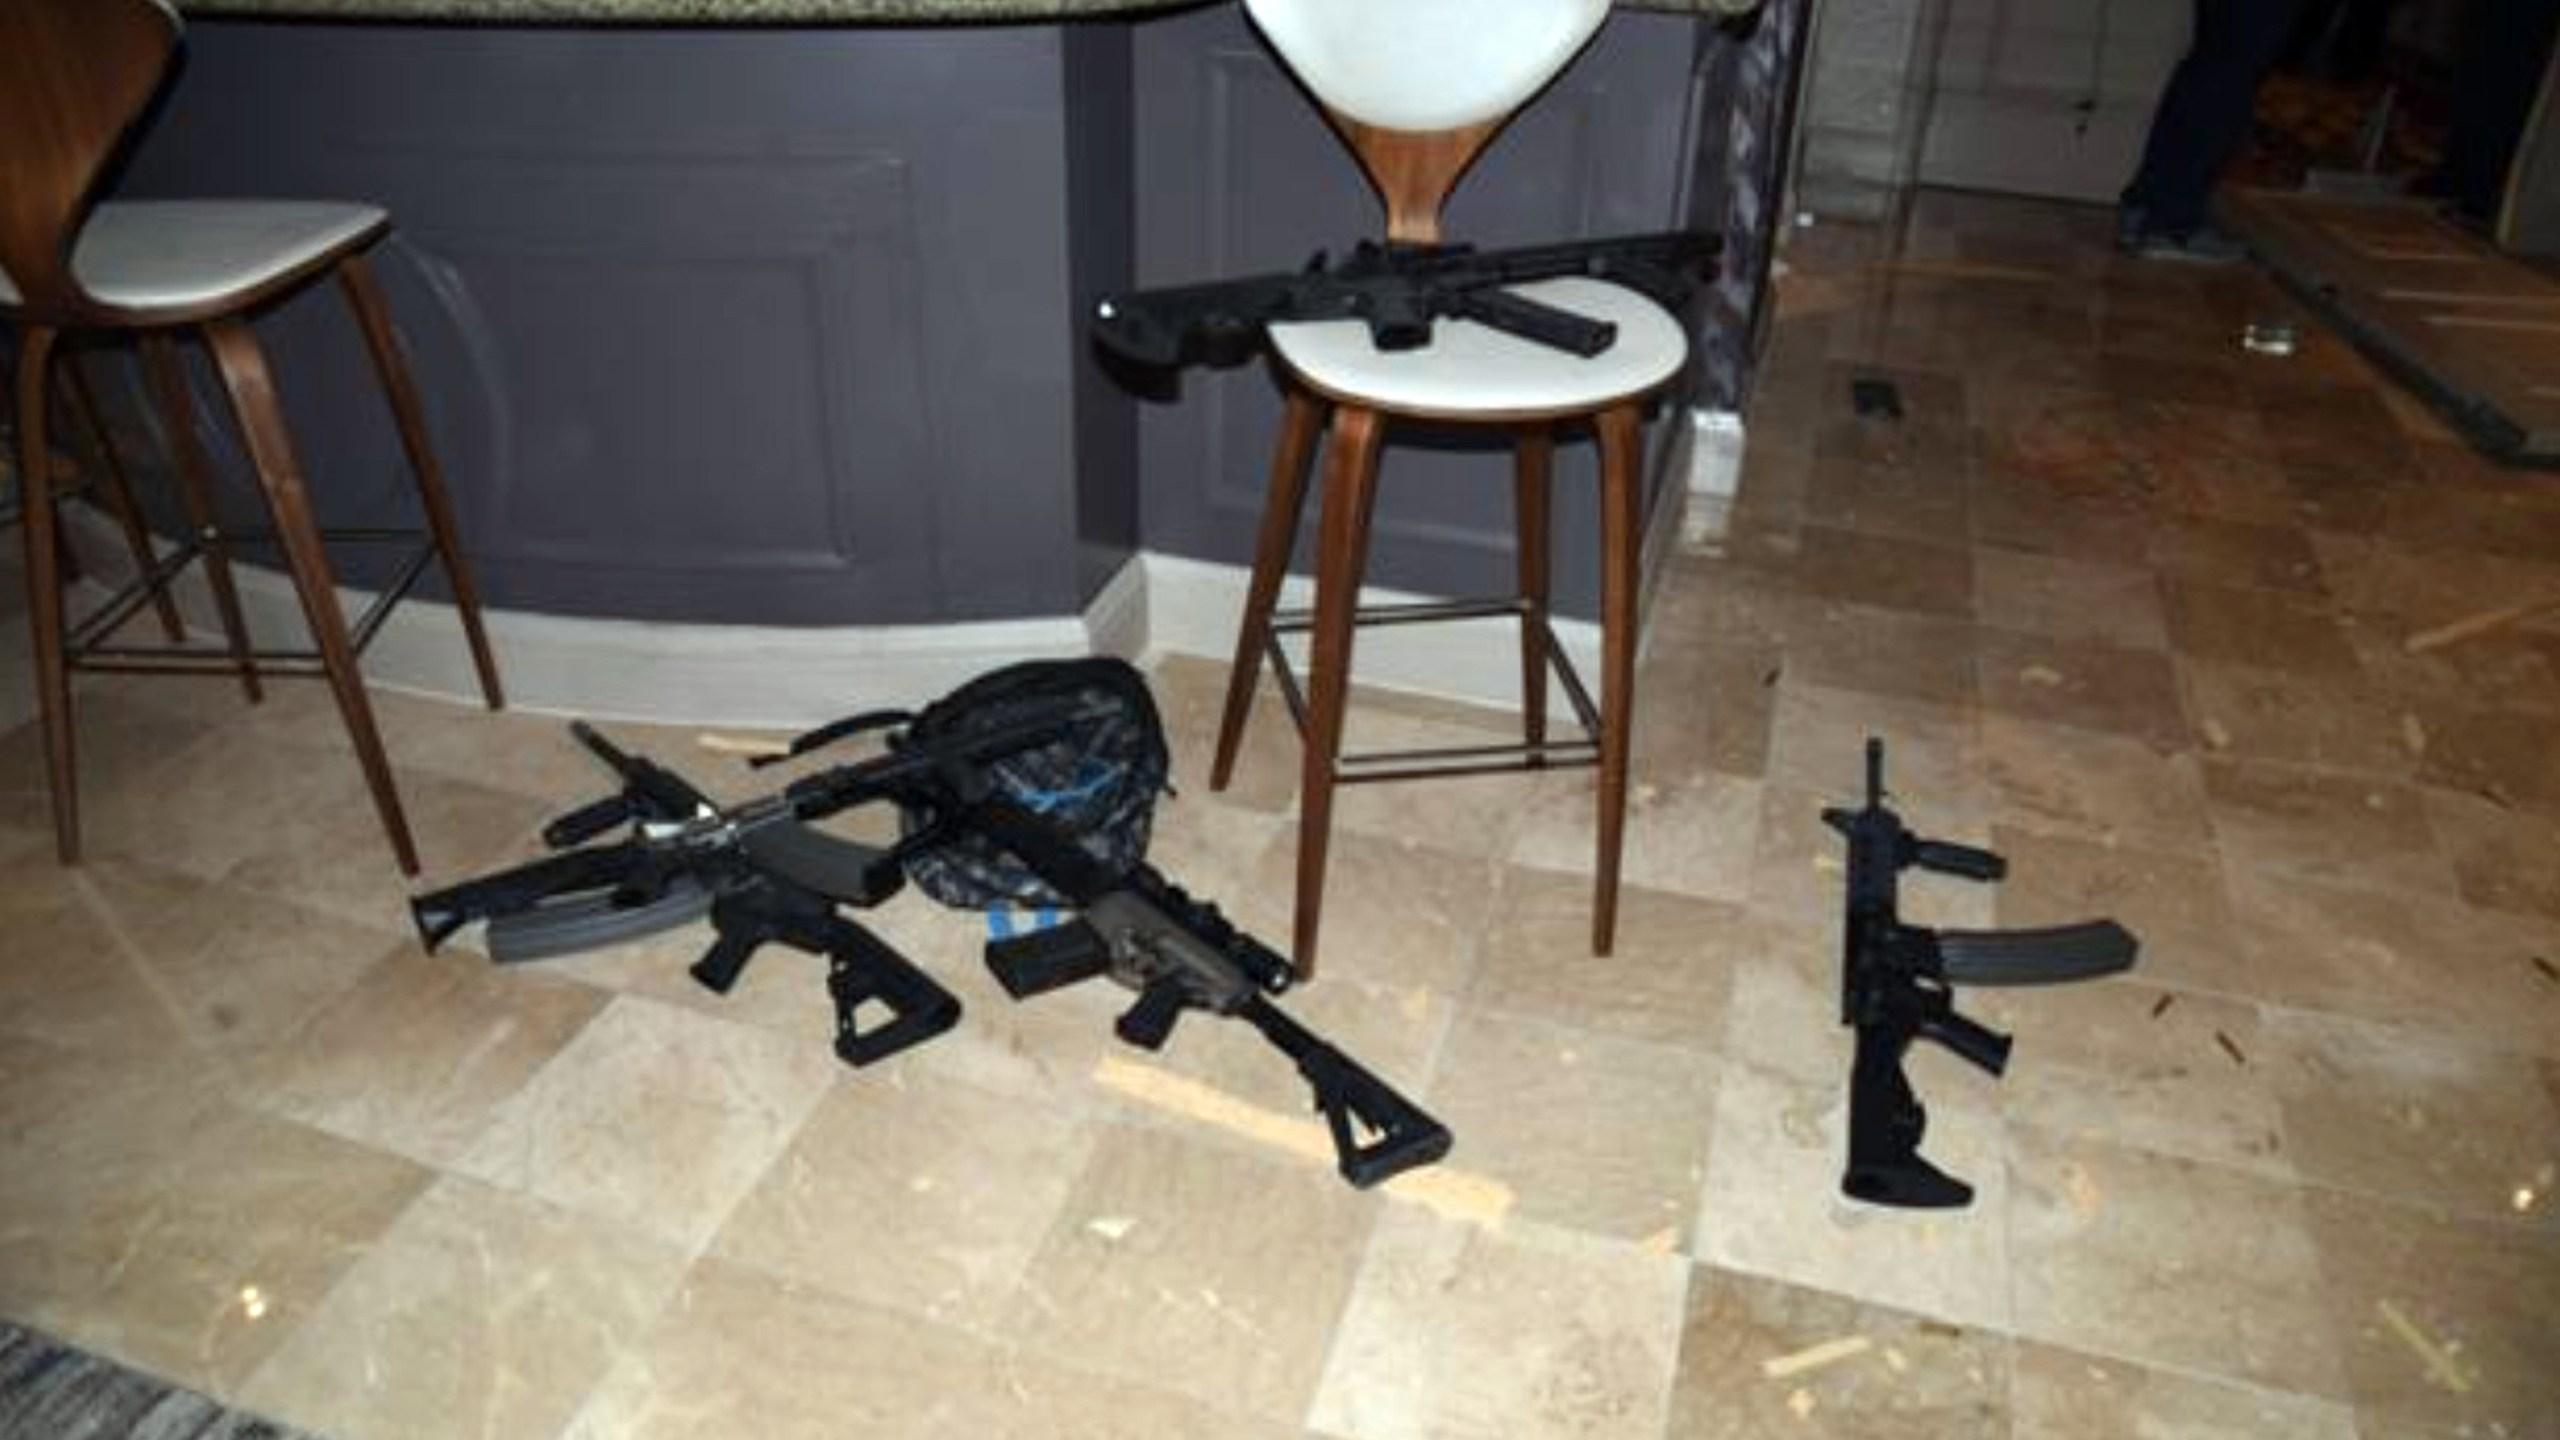 Las_Vegas_Shooting_Warrants_88738-159532.jpg20509031